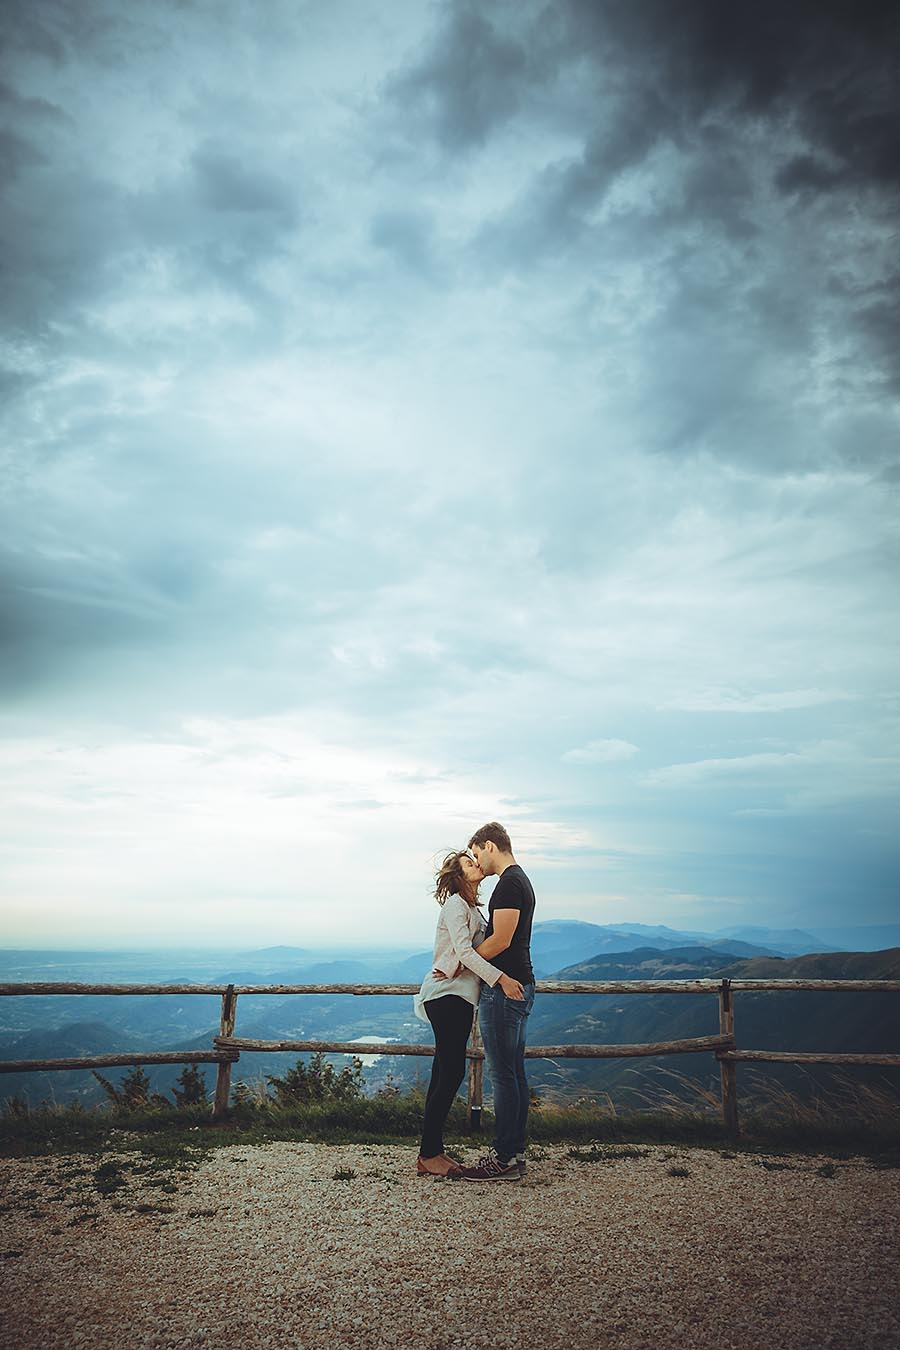 Renato_Zanette_Fotografo_Vittorio_Veneto_Samuela_Carlo_Insieme_Pregnancy_Modherhood_Monte_Pizzoc_Noi